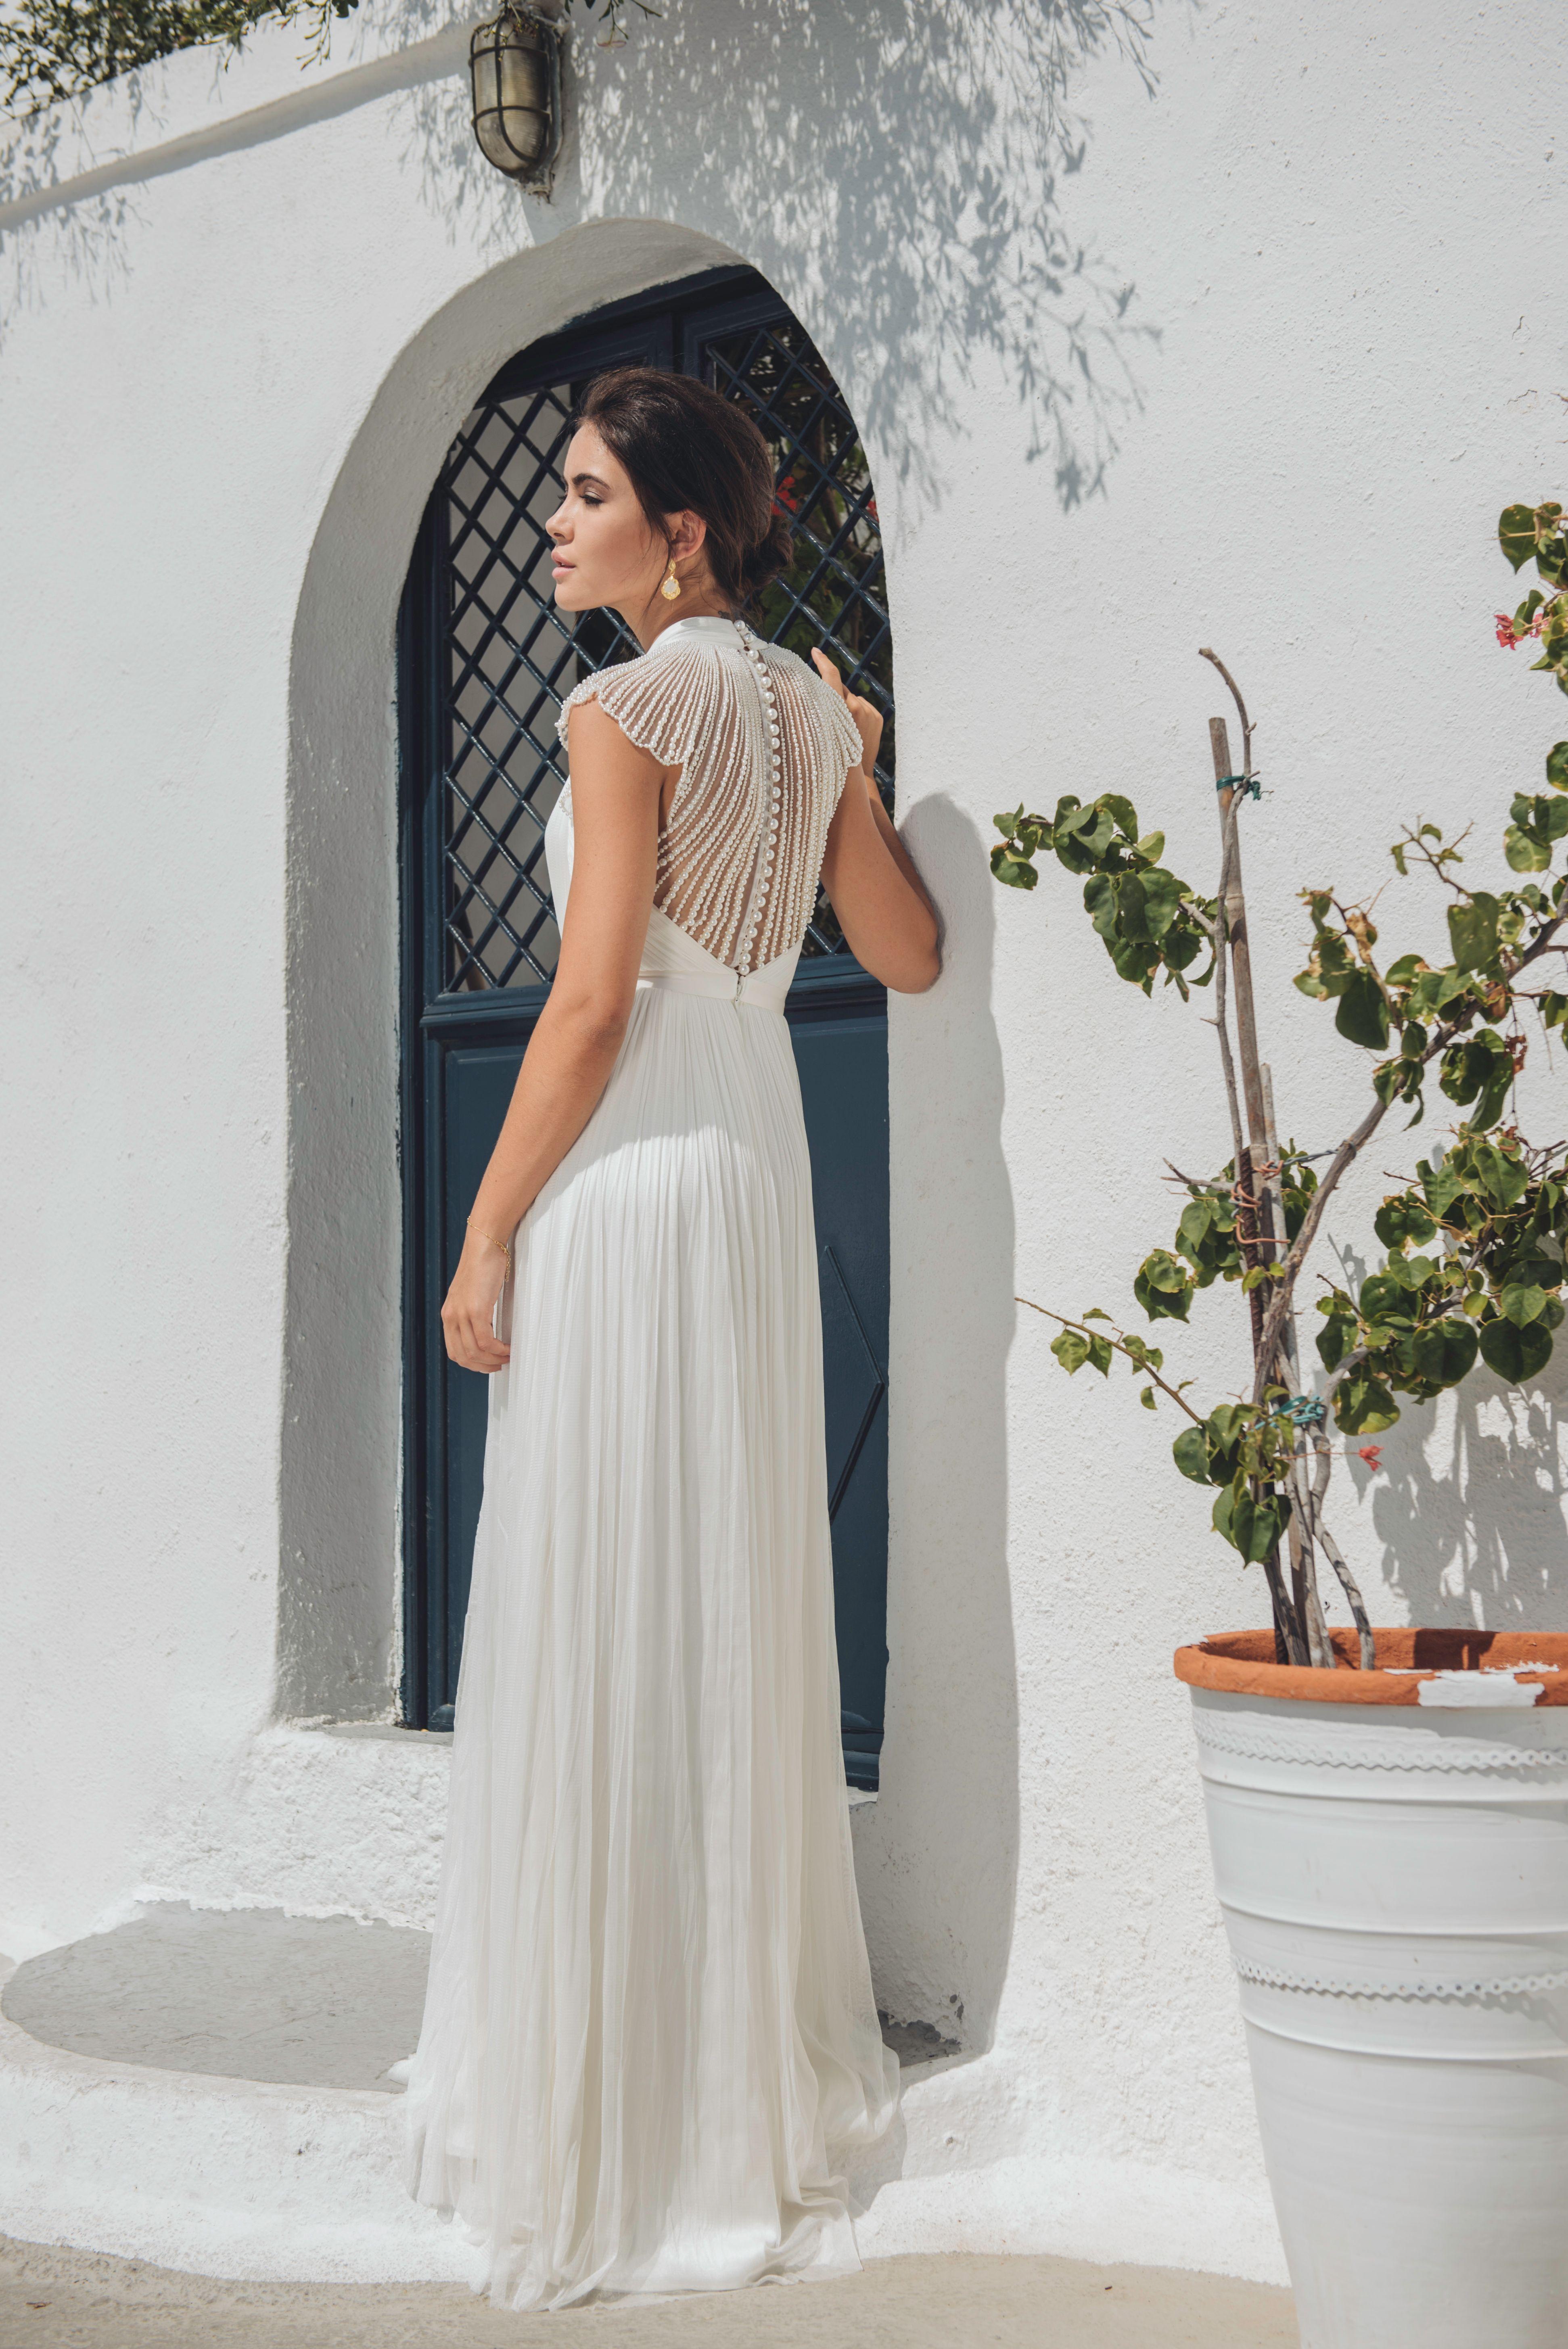 41+ Catherine deane dress ideas